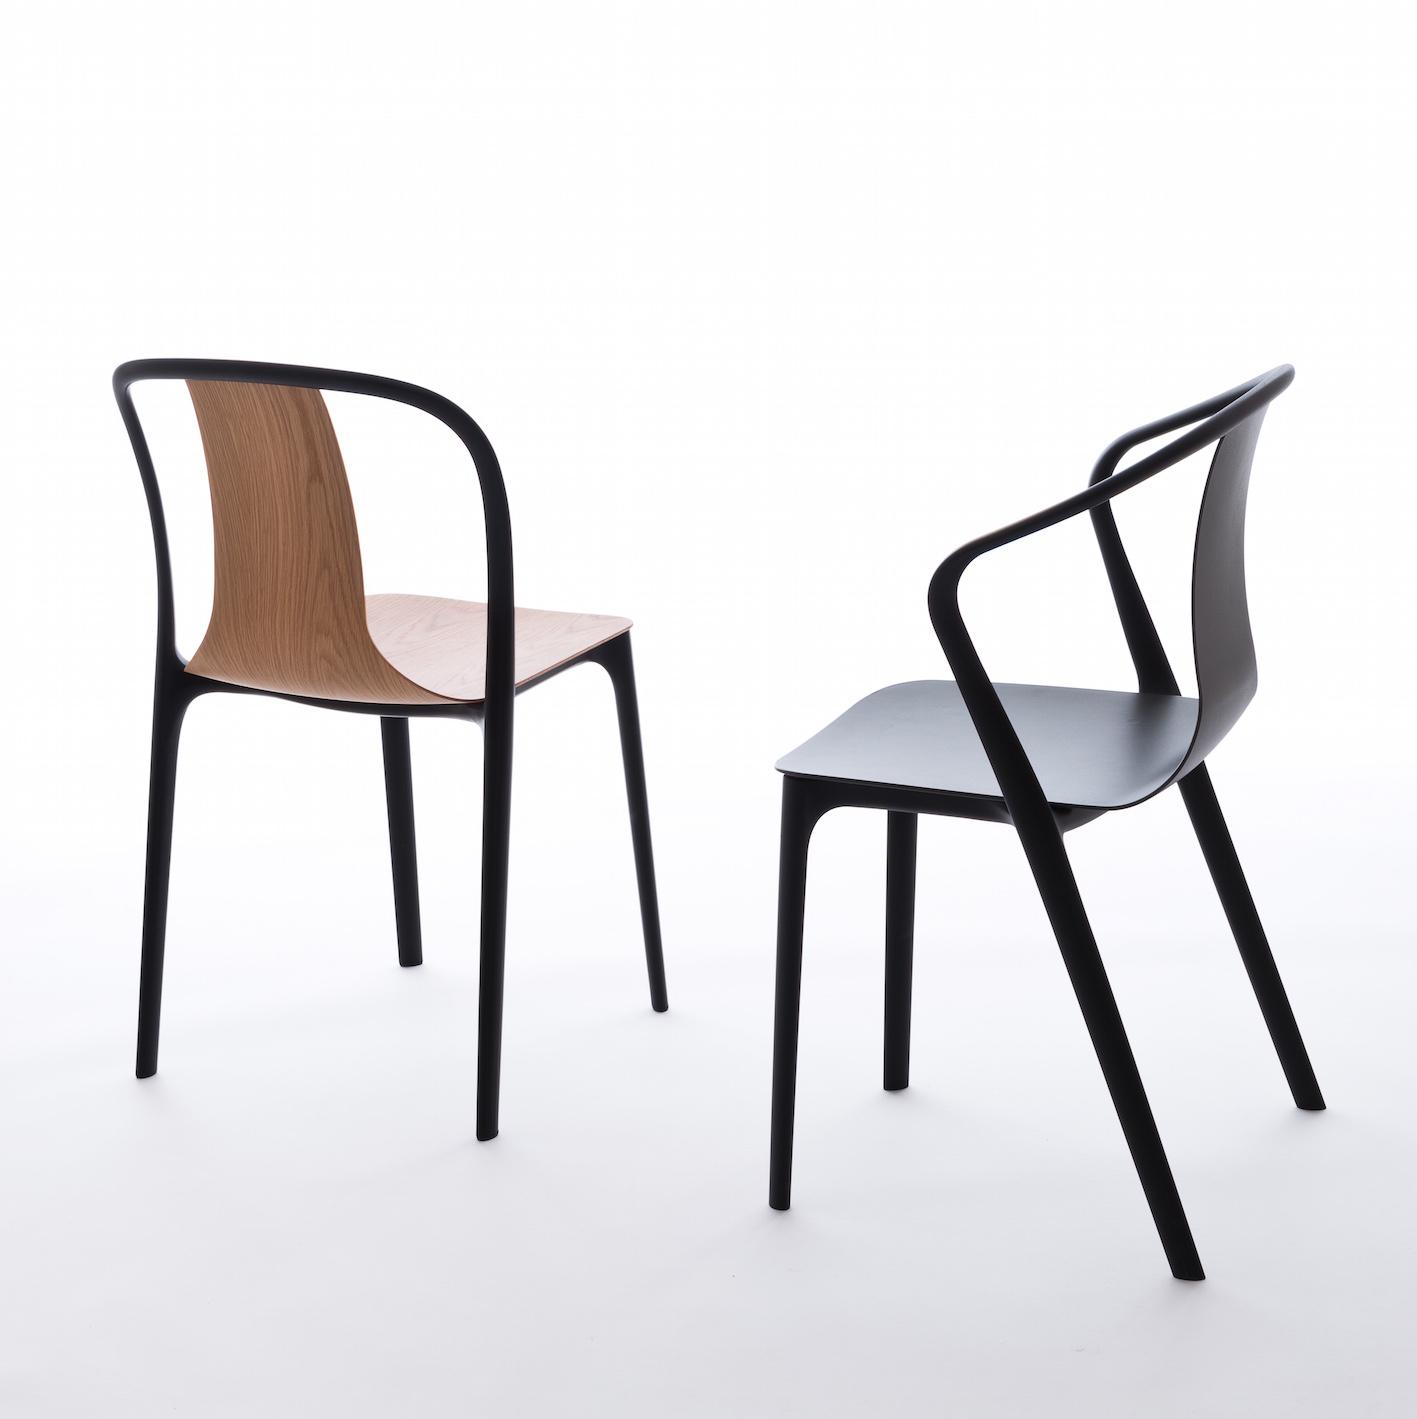 Belleville Collection, design di Ronan & Erwan Bouroullec, 2015.